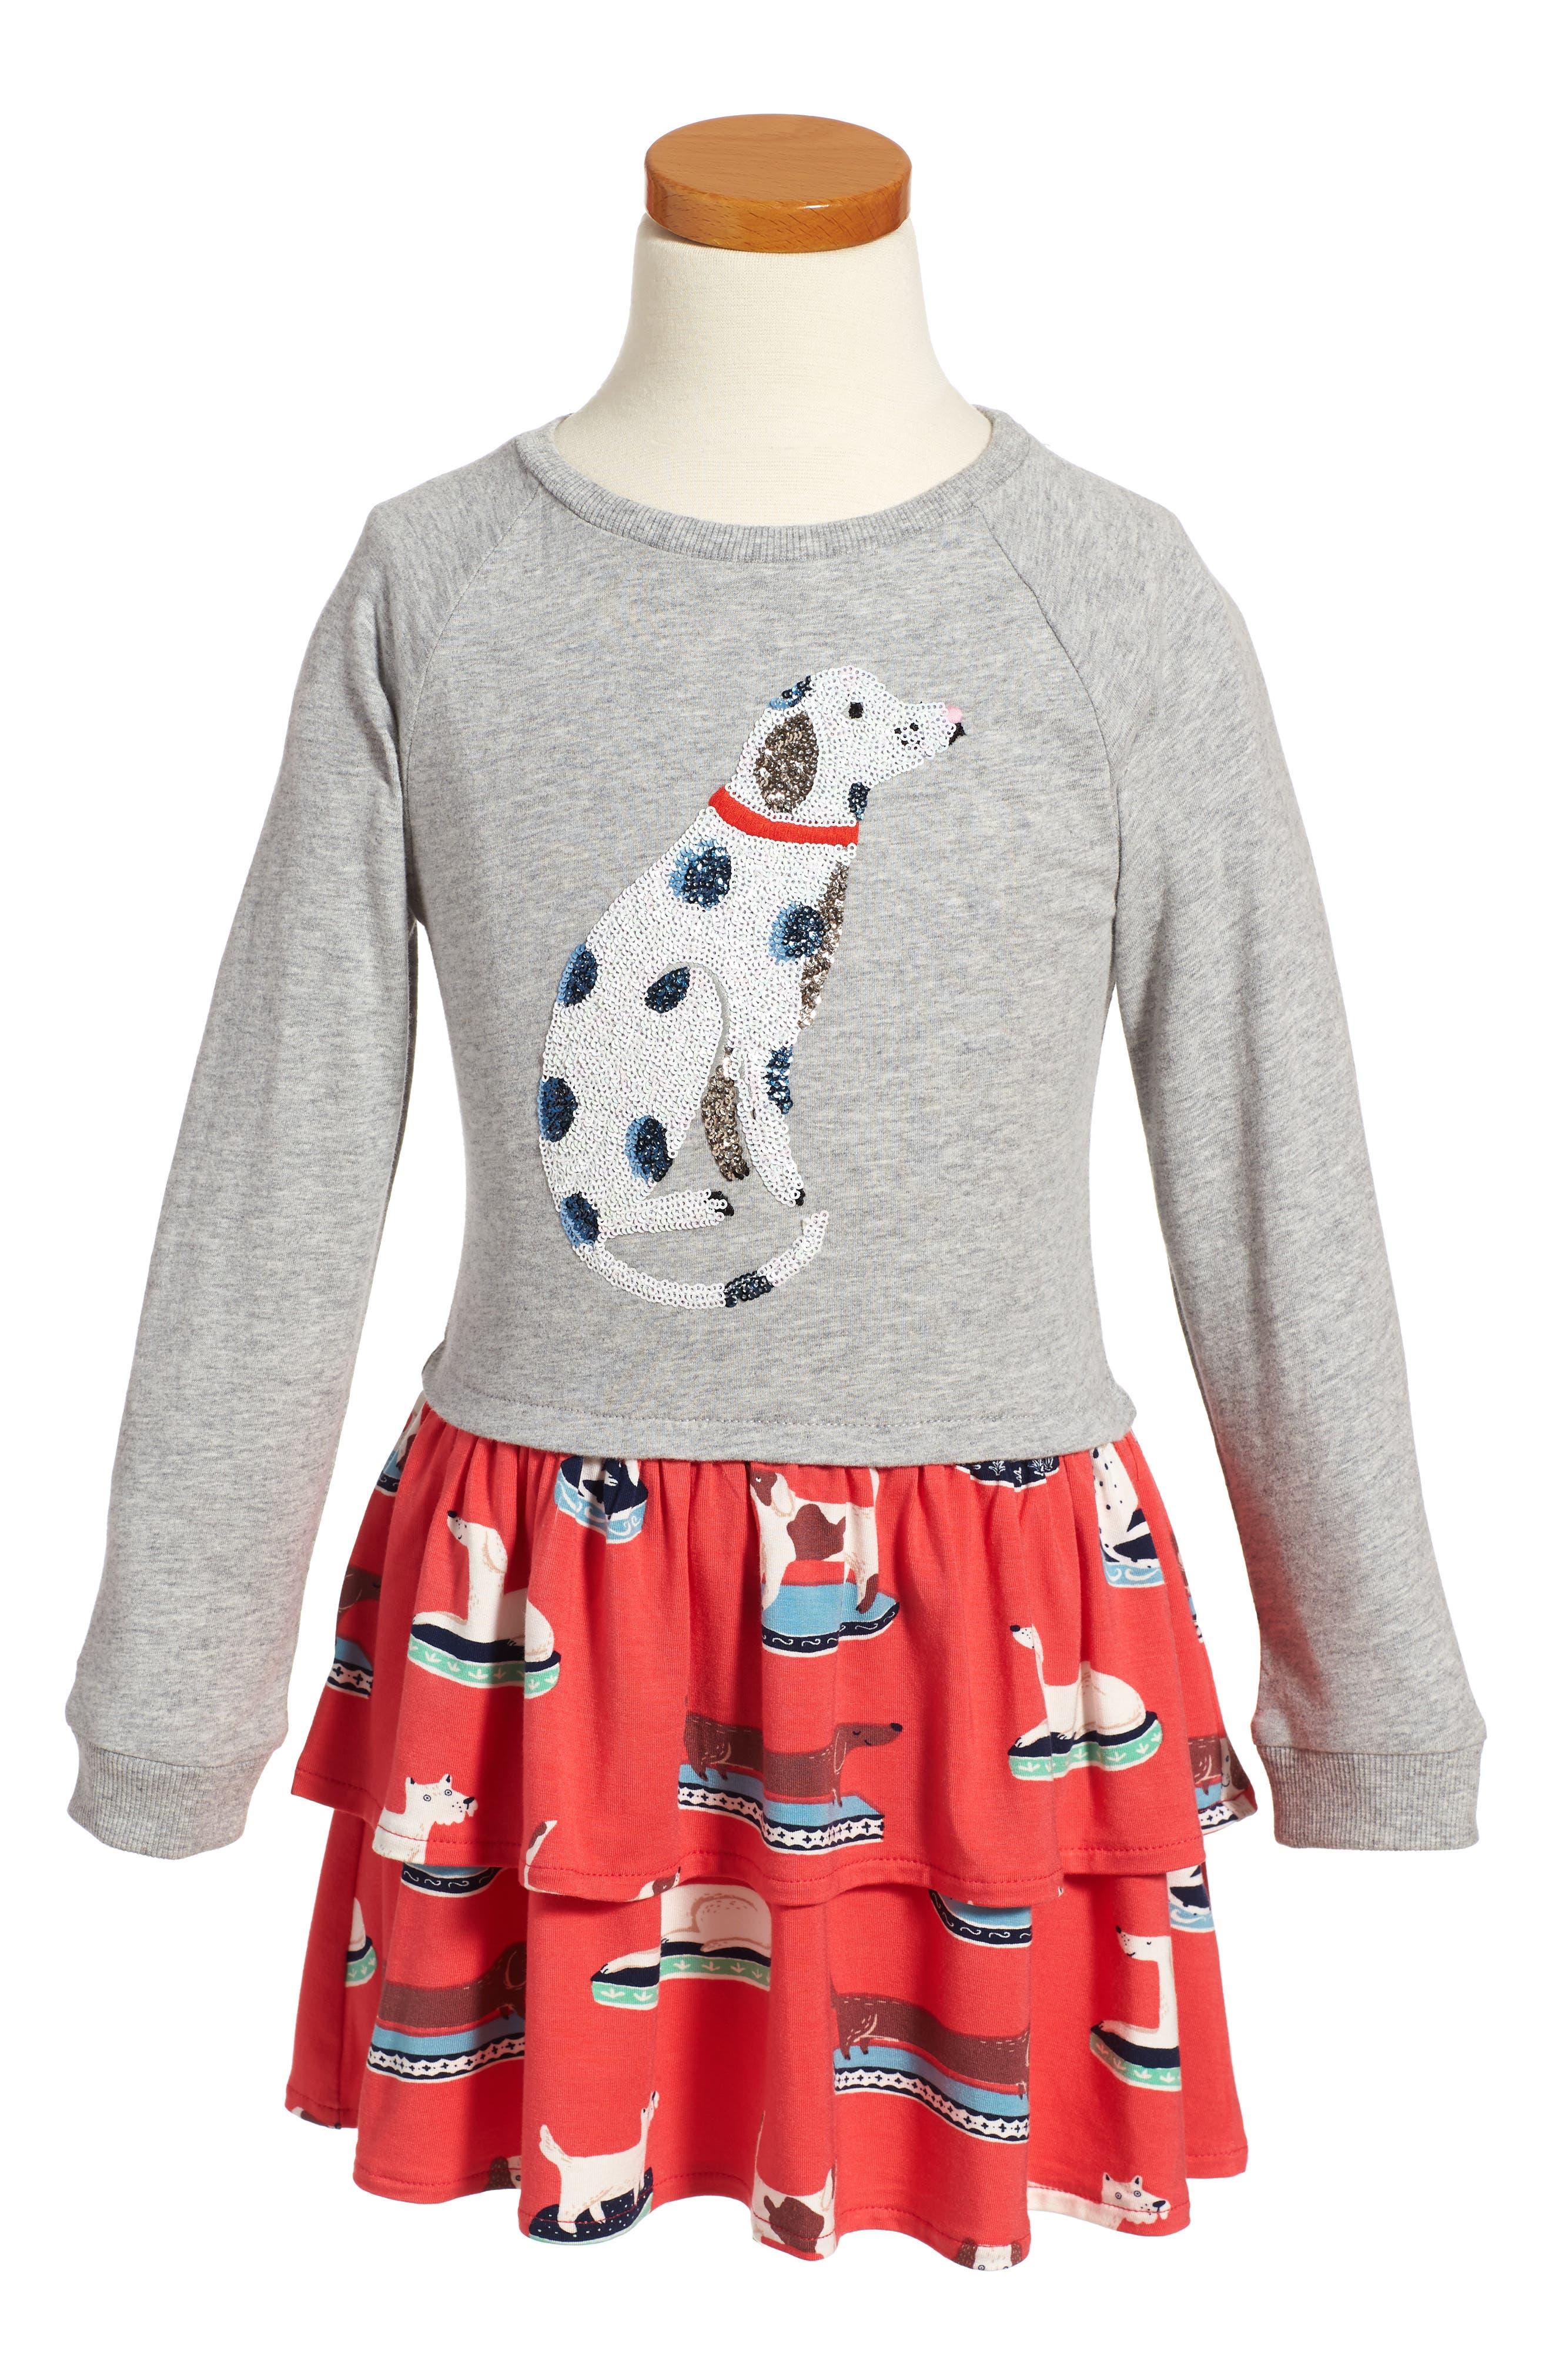 Main Image - Mini Boden Twirly Sequin Dalmatian Dress (Toddler Girls, Little Girls & Big Girls)